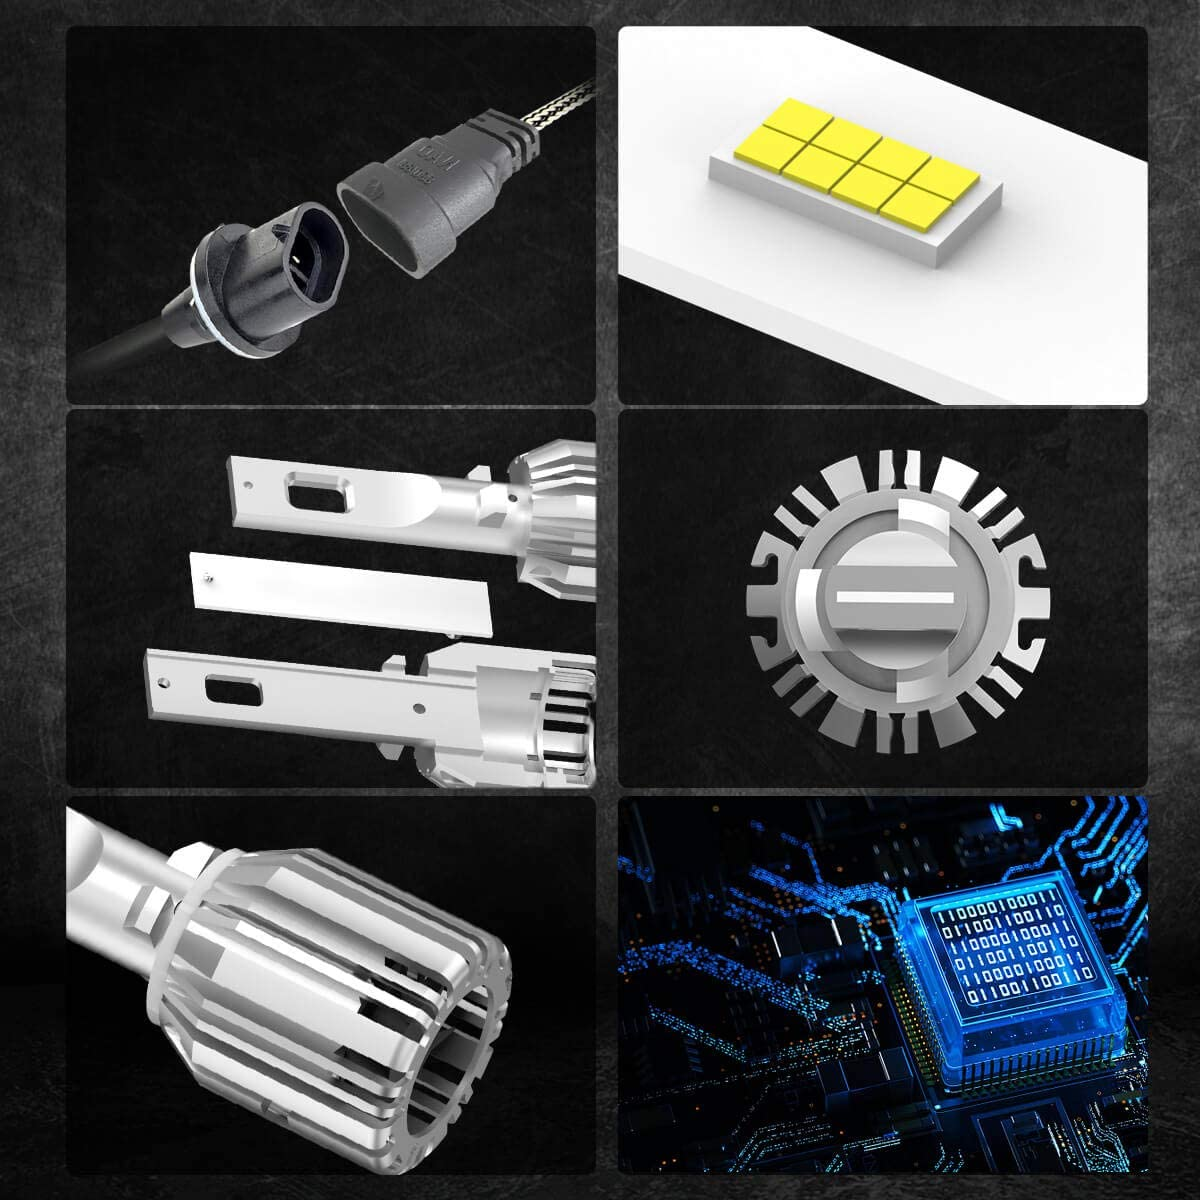 LASFIT 880 881 896 886 LED fog light bulbs 6000K Cool White 892 893 894 898 899 885 LED Fog Lamp Super Bright 50W New Gen LC Plus Plug and Play